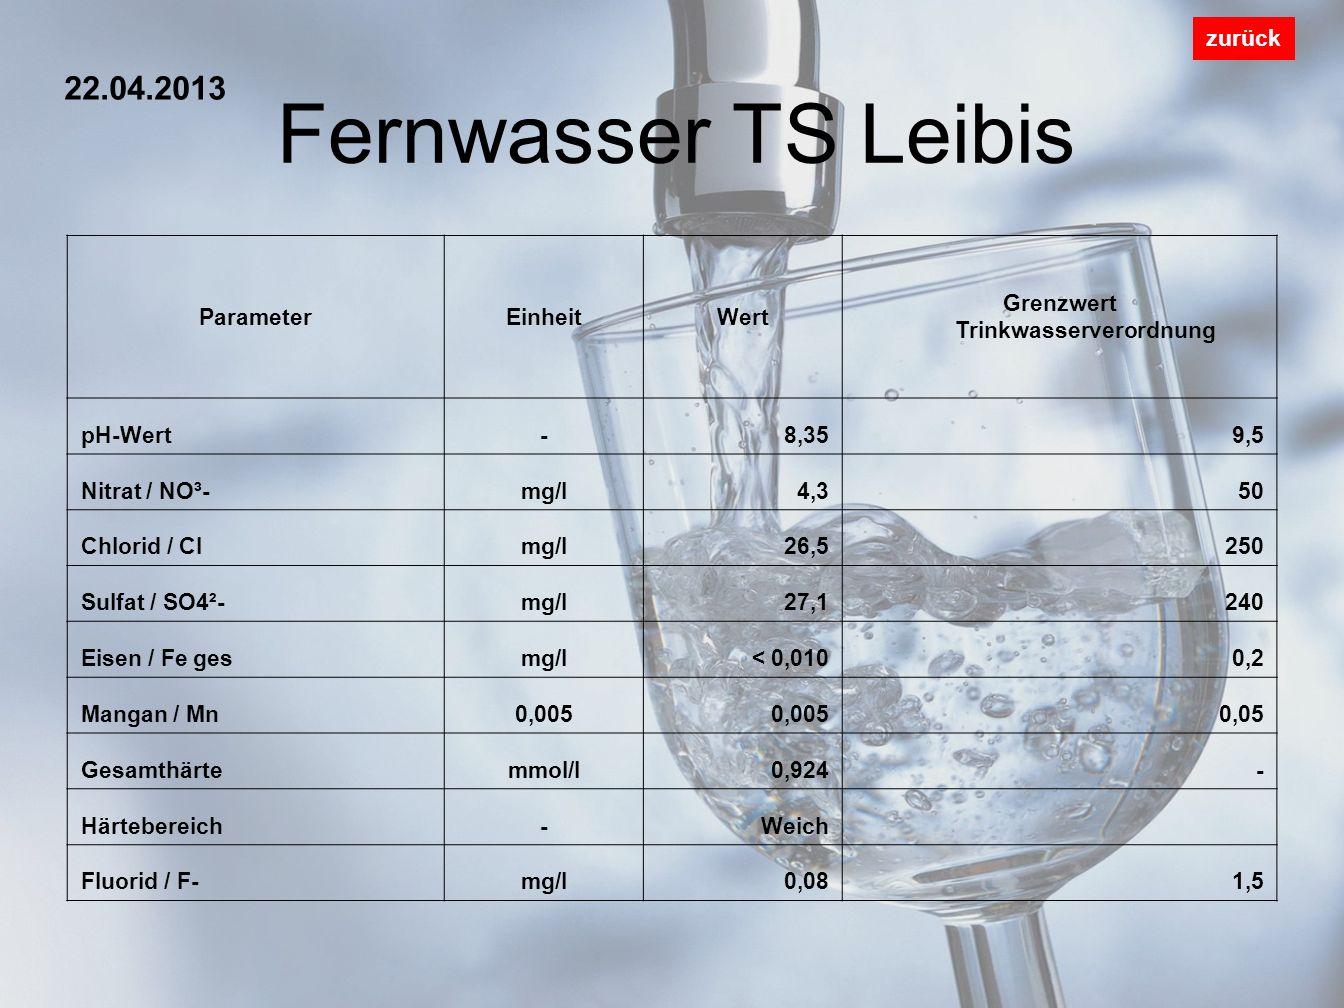 Fernwasser TS Leibis zurück ParameterEinheitWert Grenzwert Trinkwasserverordnung pH-Wert-8,359,5 Nitrat / NO³-mg/l4,350 Chlorid / Clmg/l26,5250 Sulfat